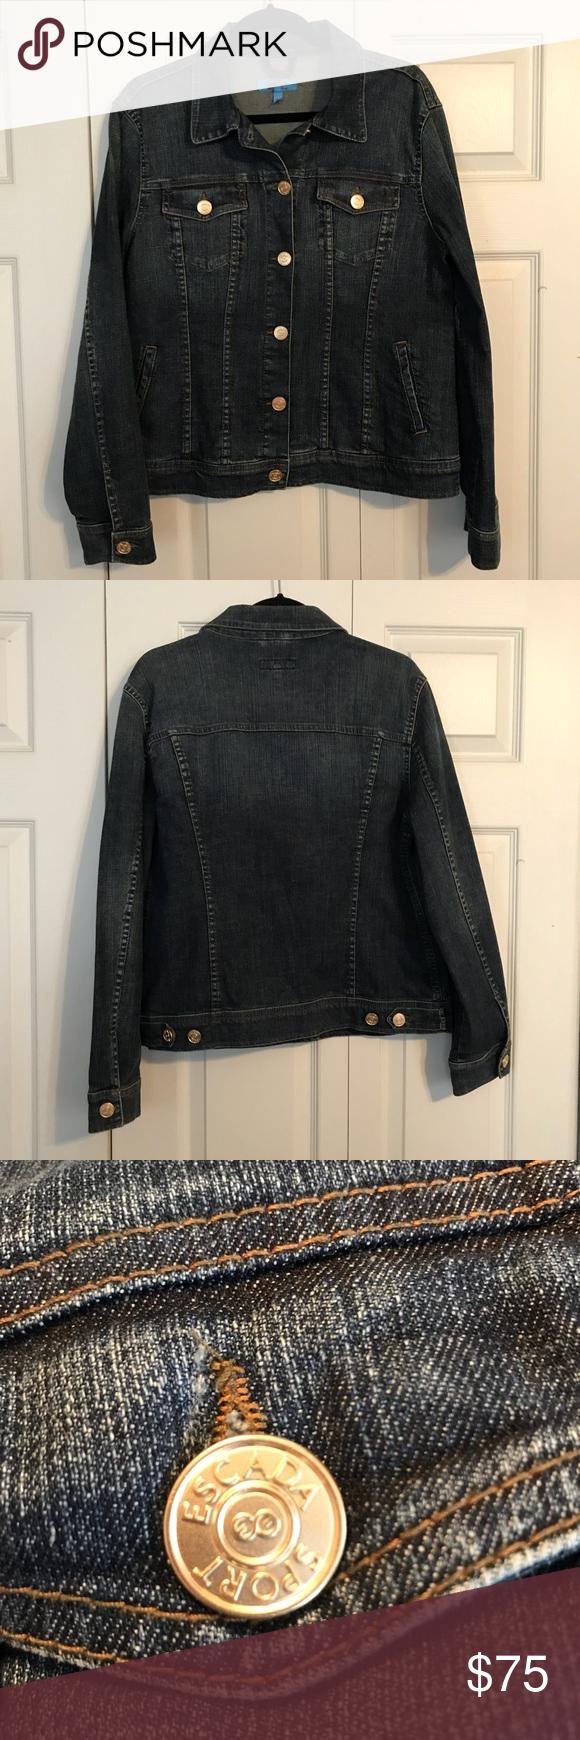 Escada Sport Nwot Jean Jacket Size 42 Dark Wash Jackets Escada Sport Escada [ 1740 x 580 Pixel ]